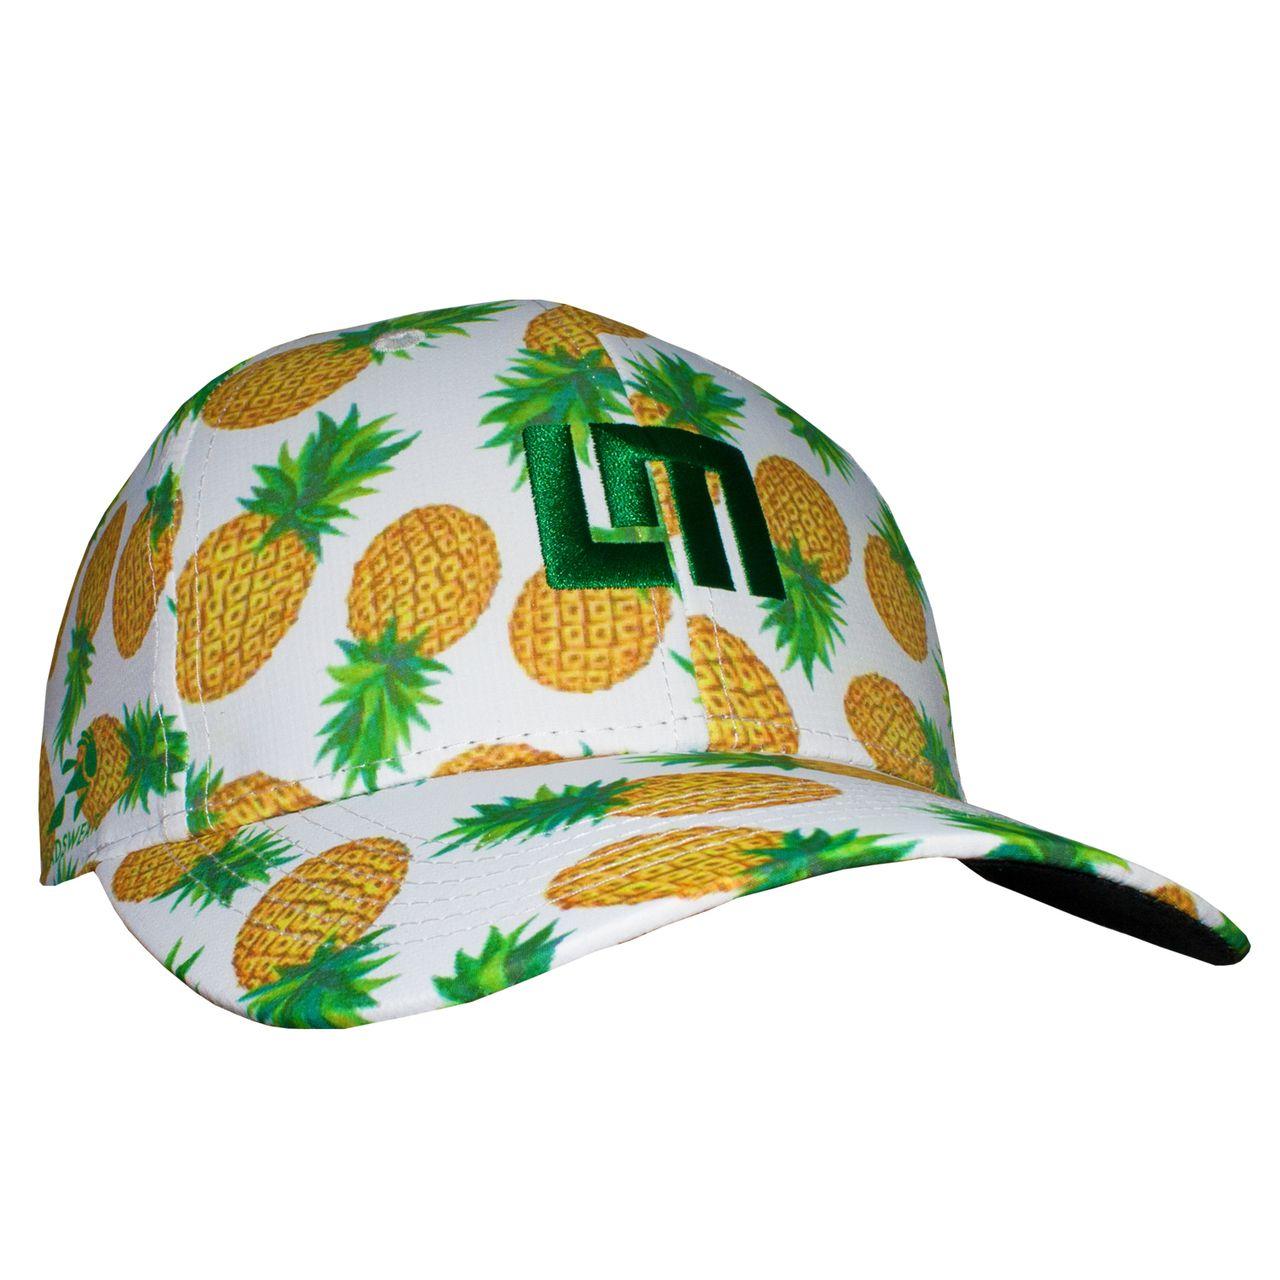 LOUDMOUTH 英國高爾夫服飾品牌-白底鳳梨休閒運動帽